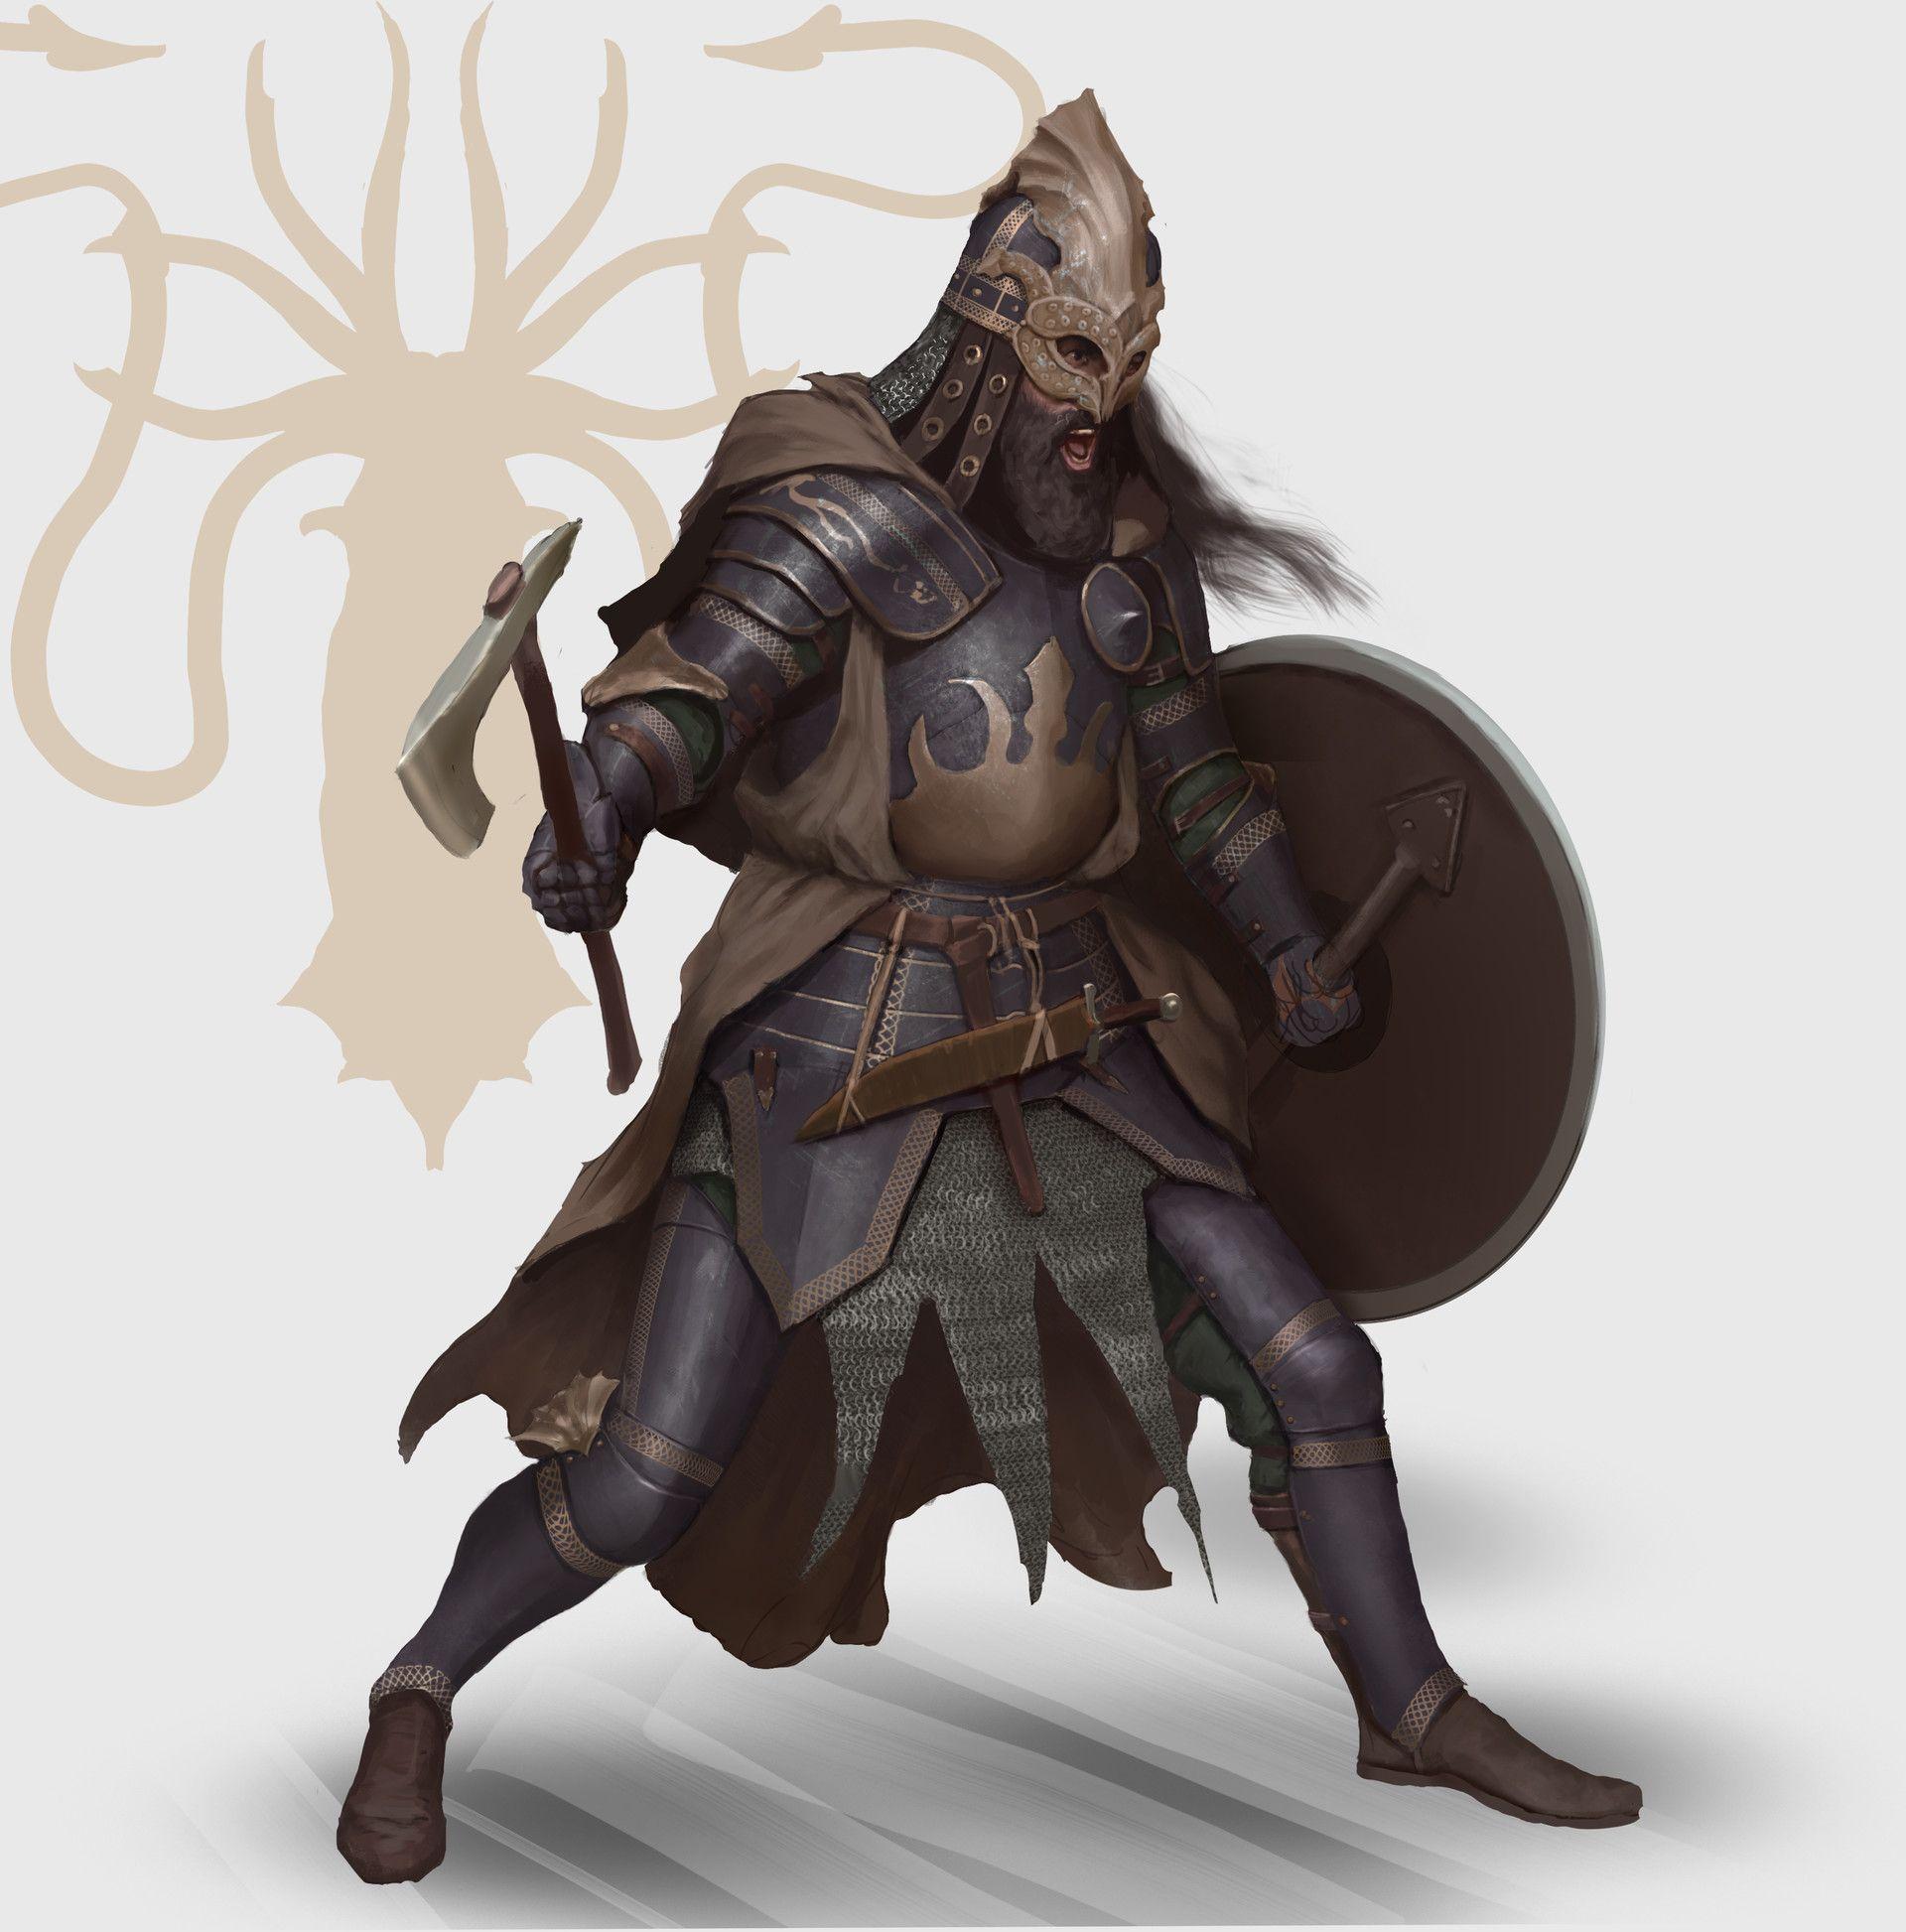 Victarion Greyjoy by Felipenn on DeviantArt |Victarion Greyjoy Helm